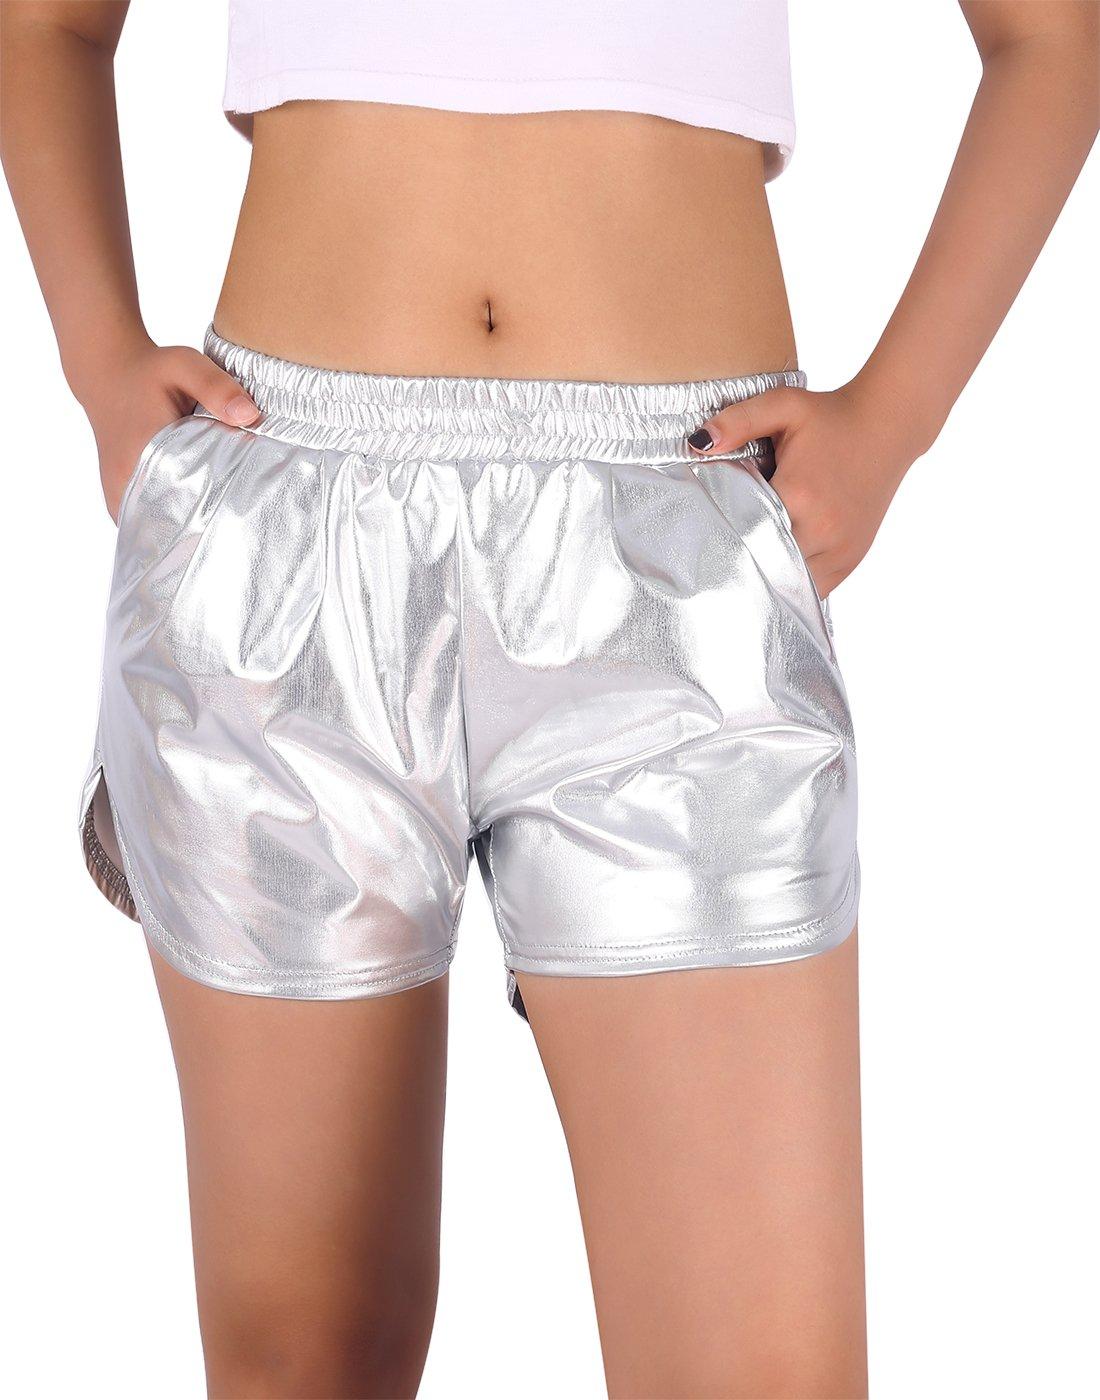 HDE Women's Hot Shorts Loose Shiny Metallic Yoga Pants (Silver, Medium)